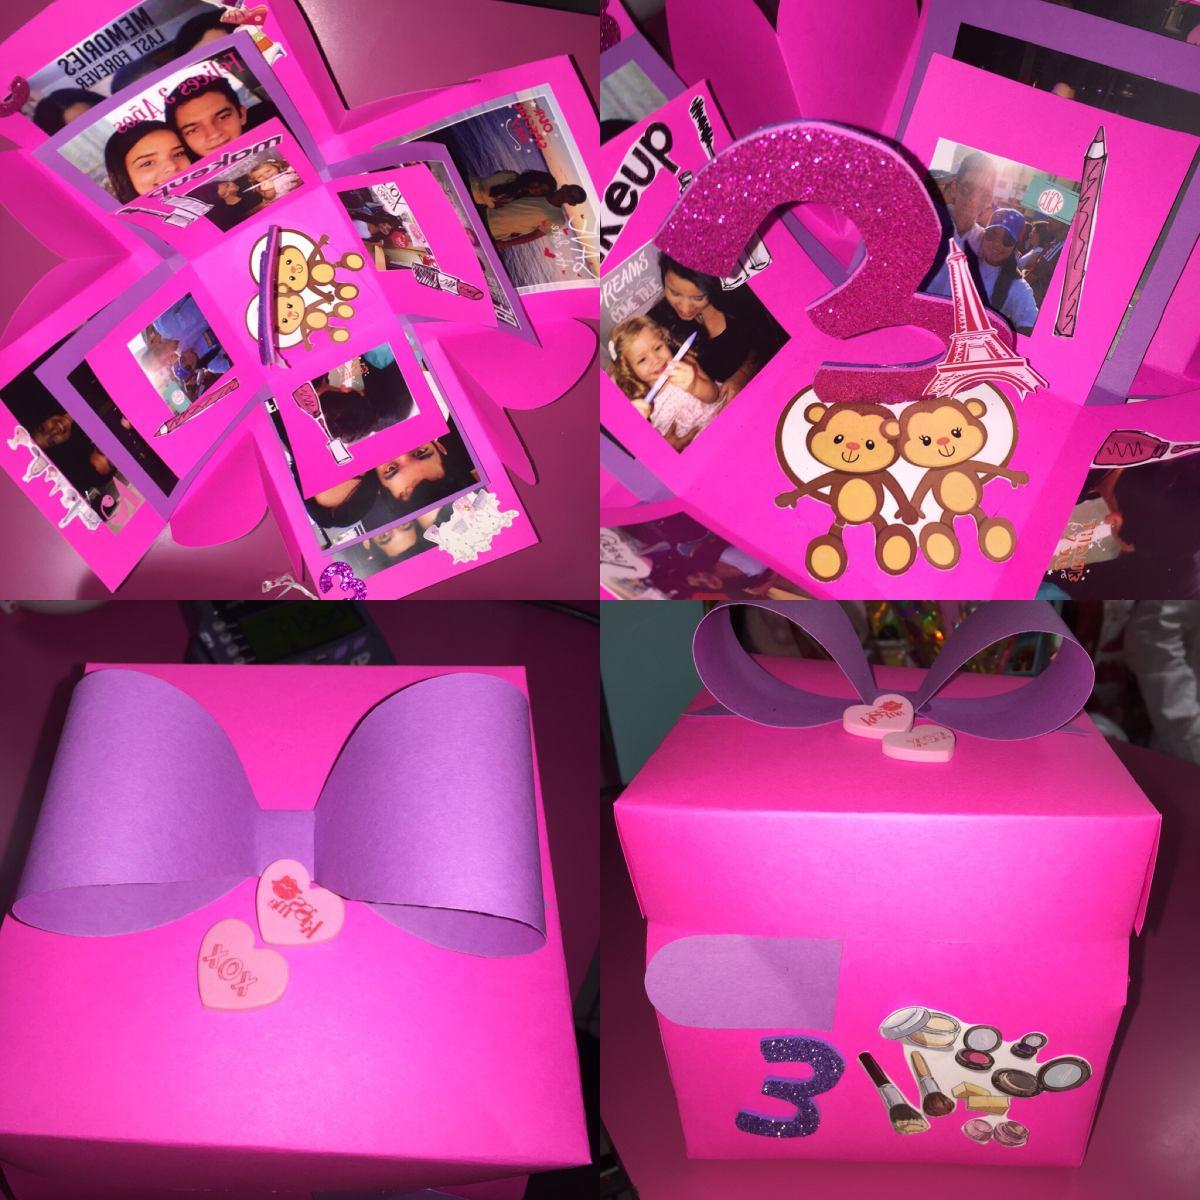 Caja sorpresa o explosiva amor cumplea os aniversario - Sorpresa cumpleanos amiga ...